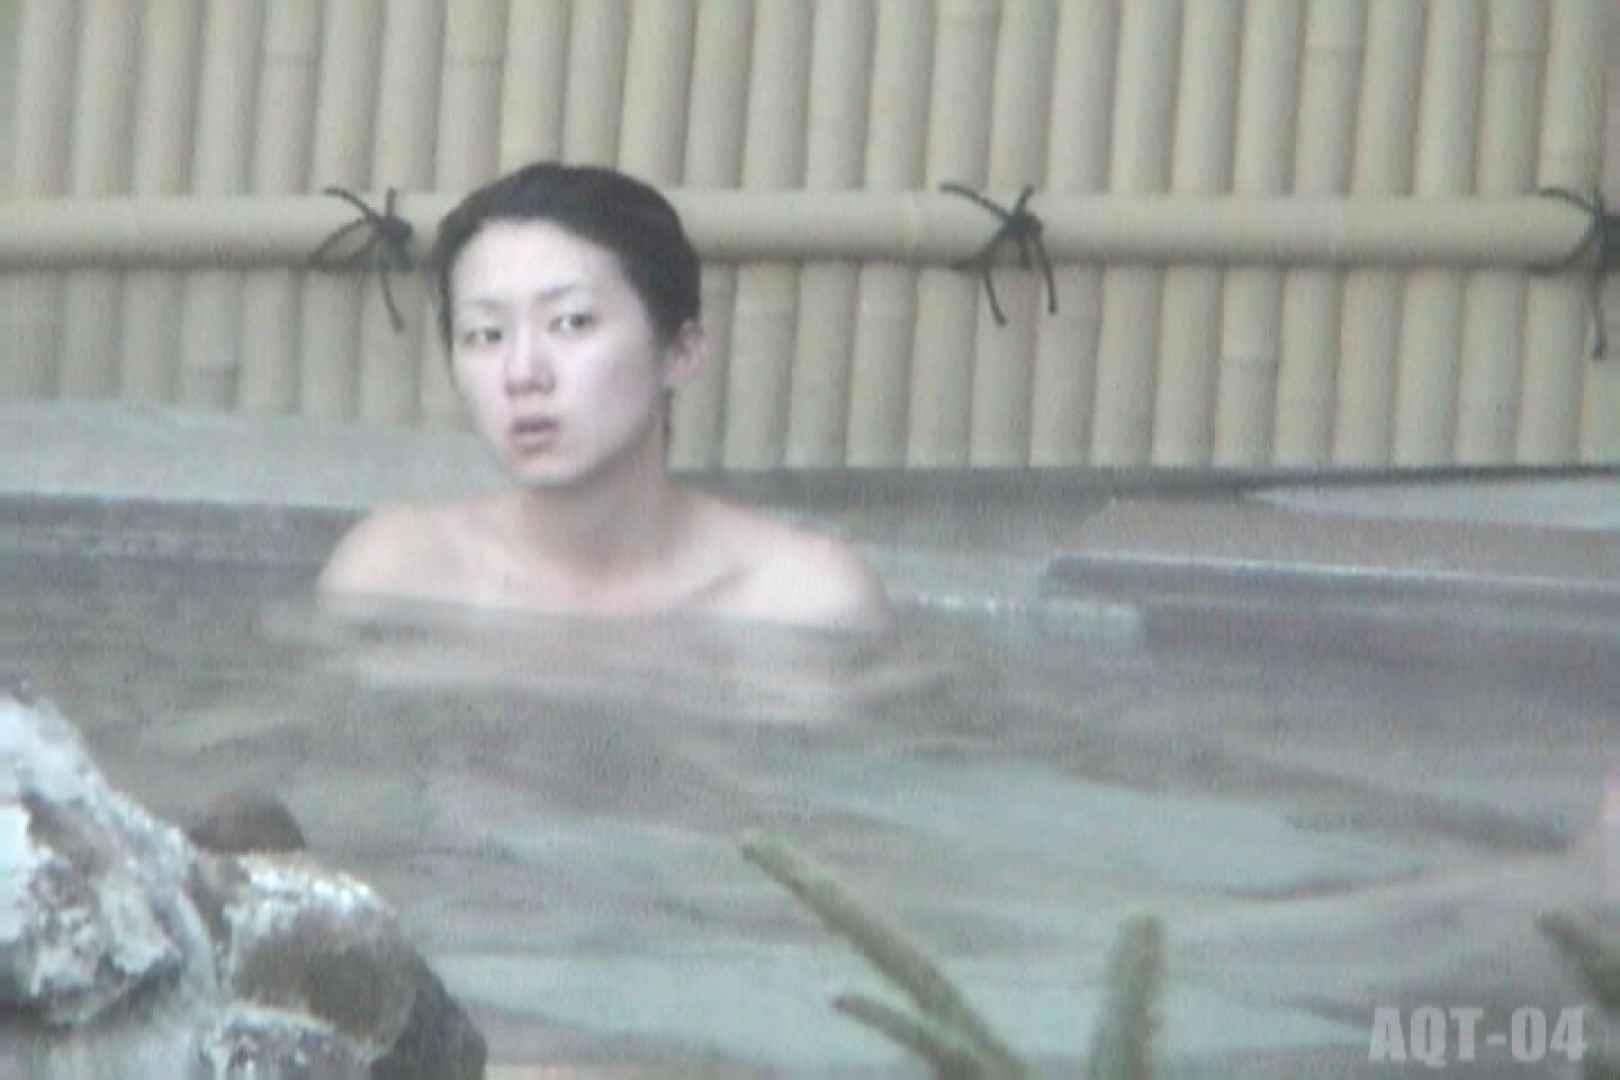 Aquaな露天風呂Vol.741 露天 | OLセックス  63画像 19